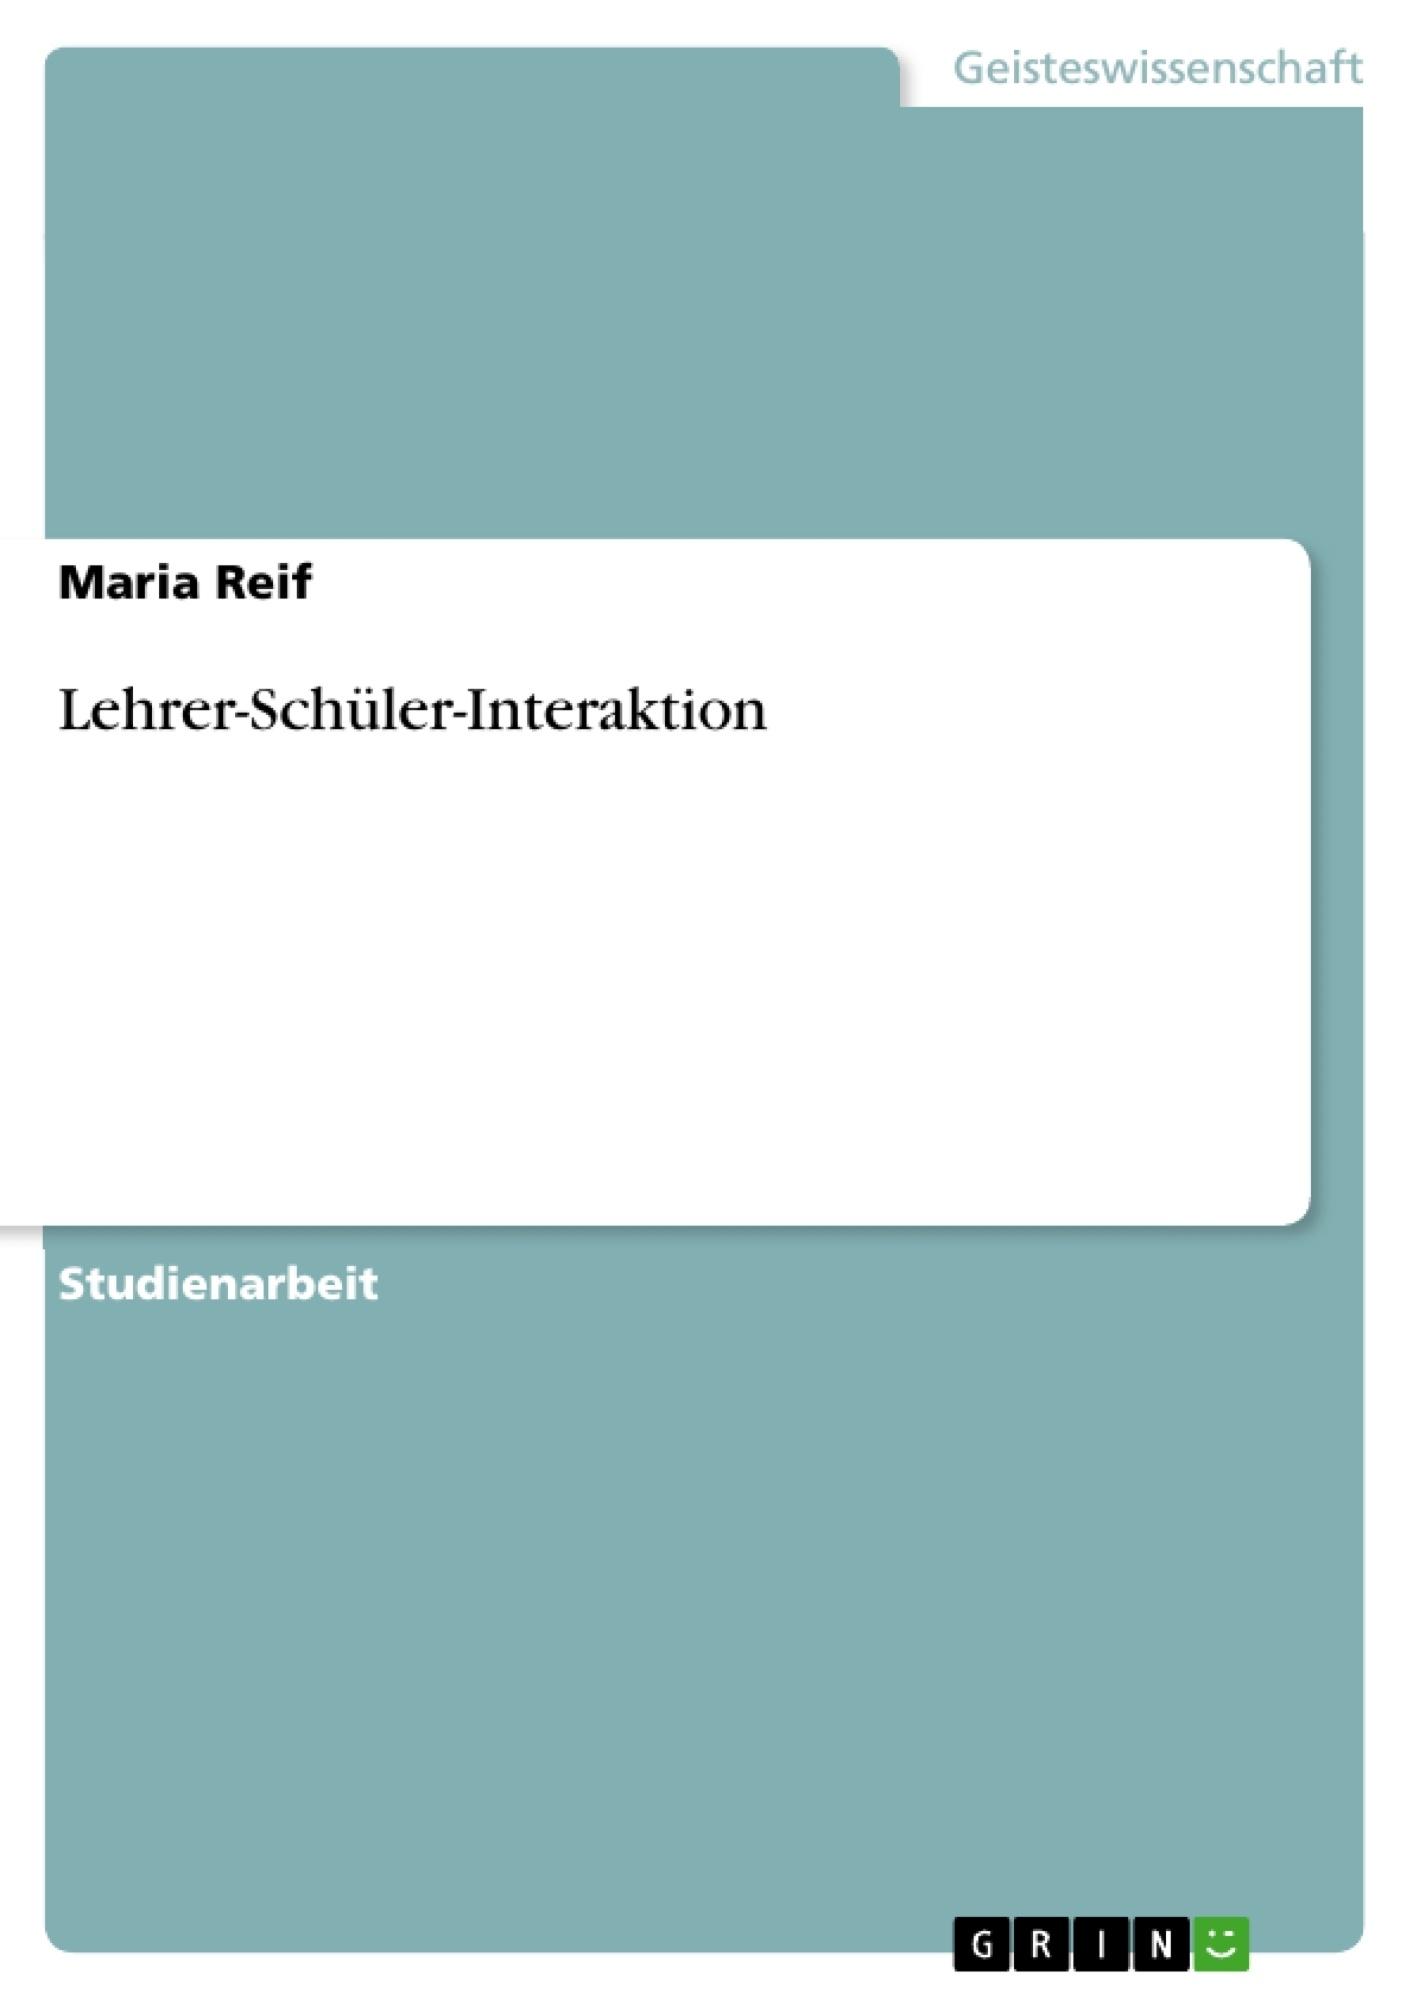 Titel: Lehrer-Schüler-Interaktion